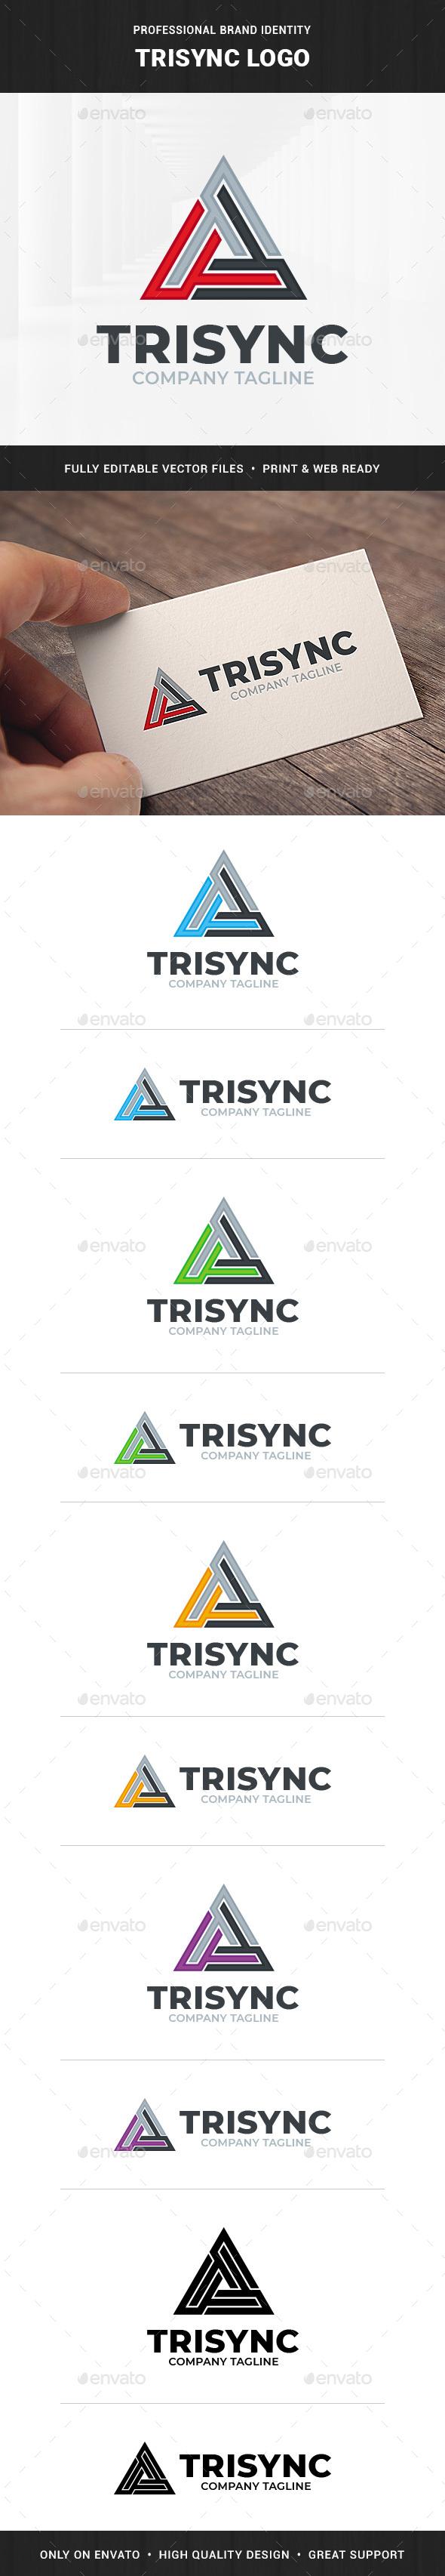 Trisync Logo Template